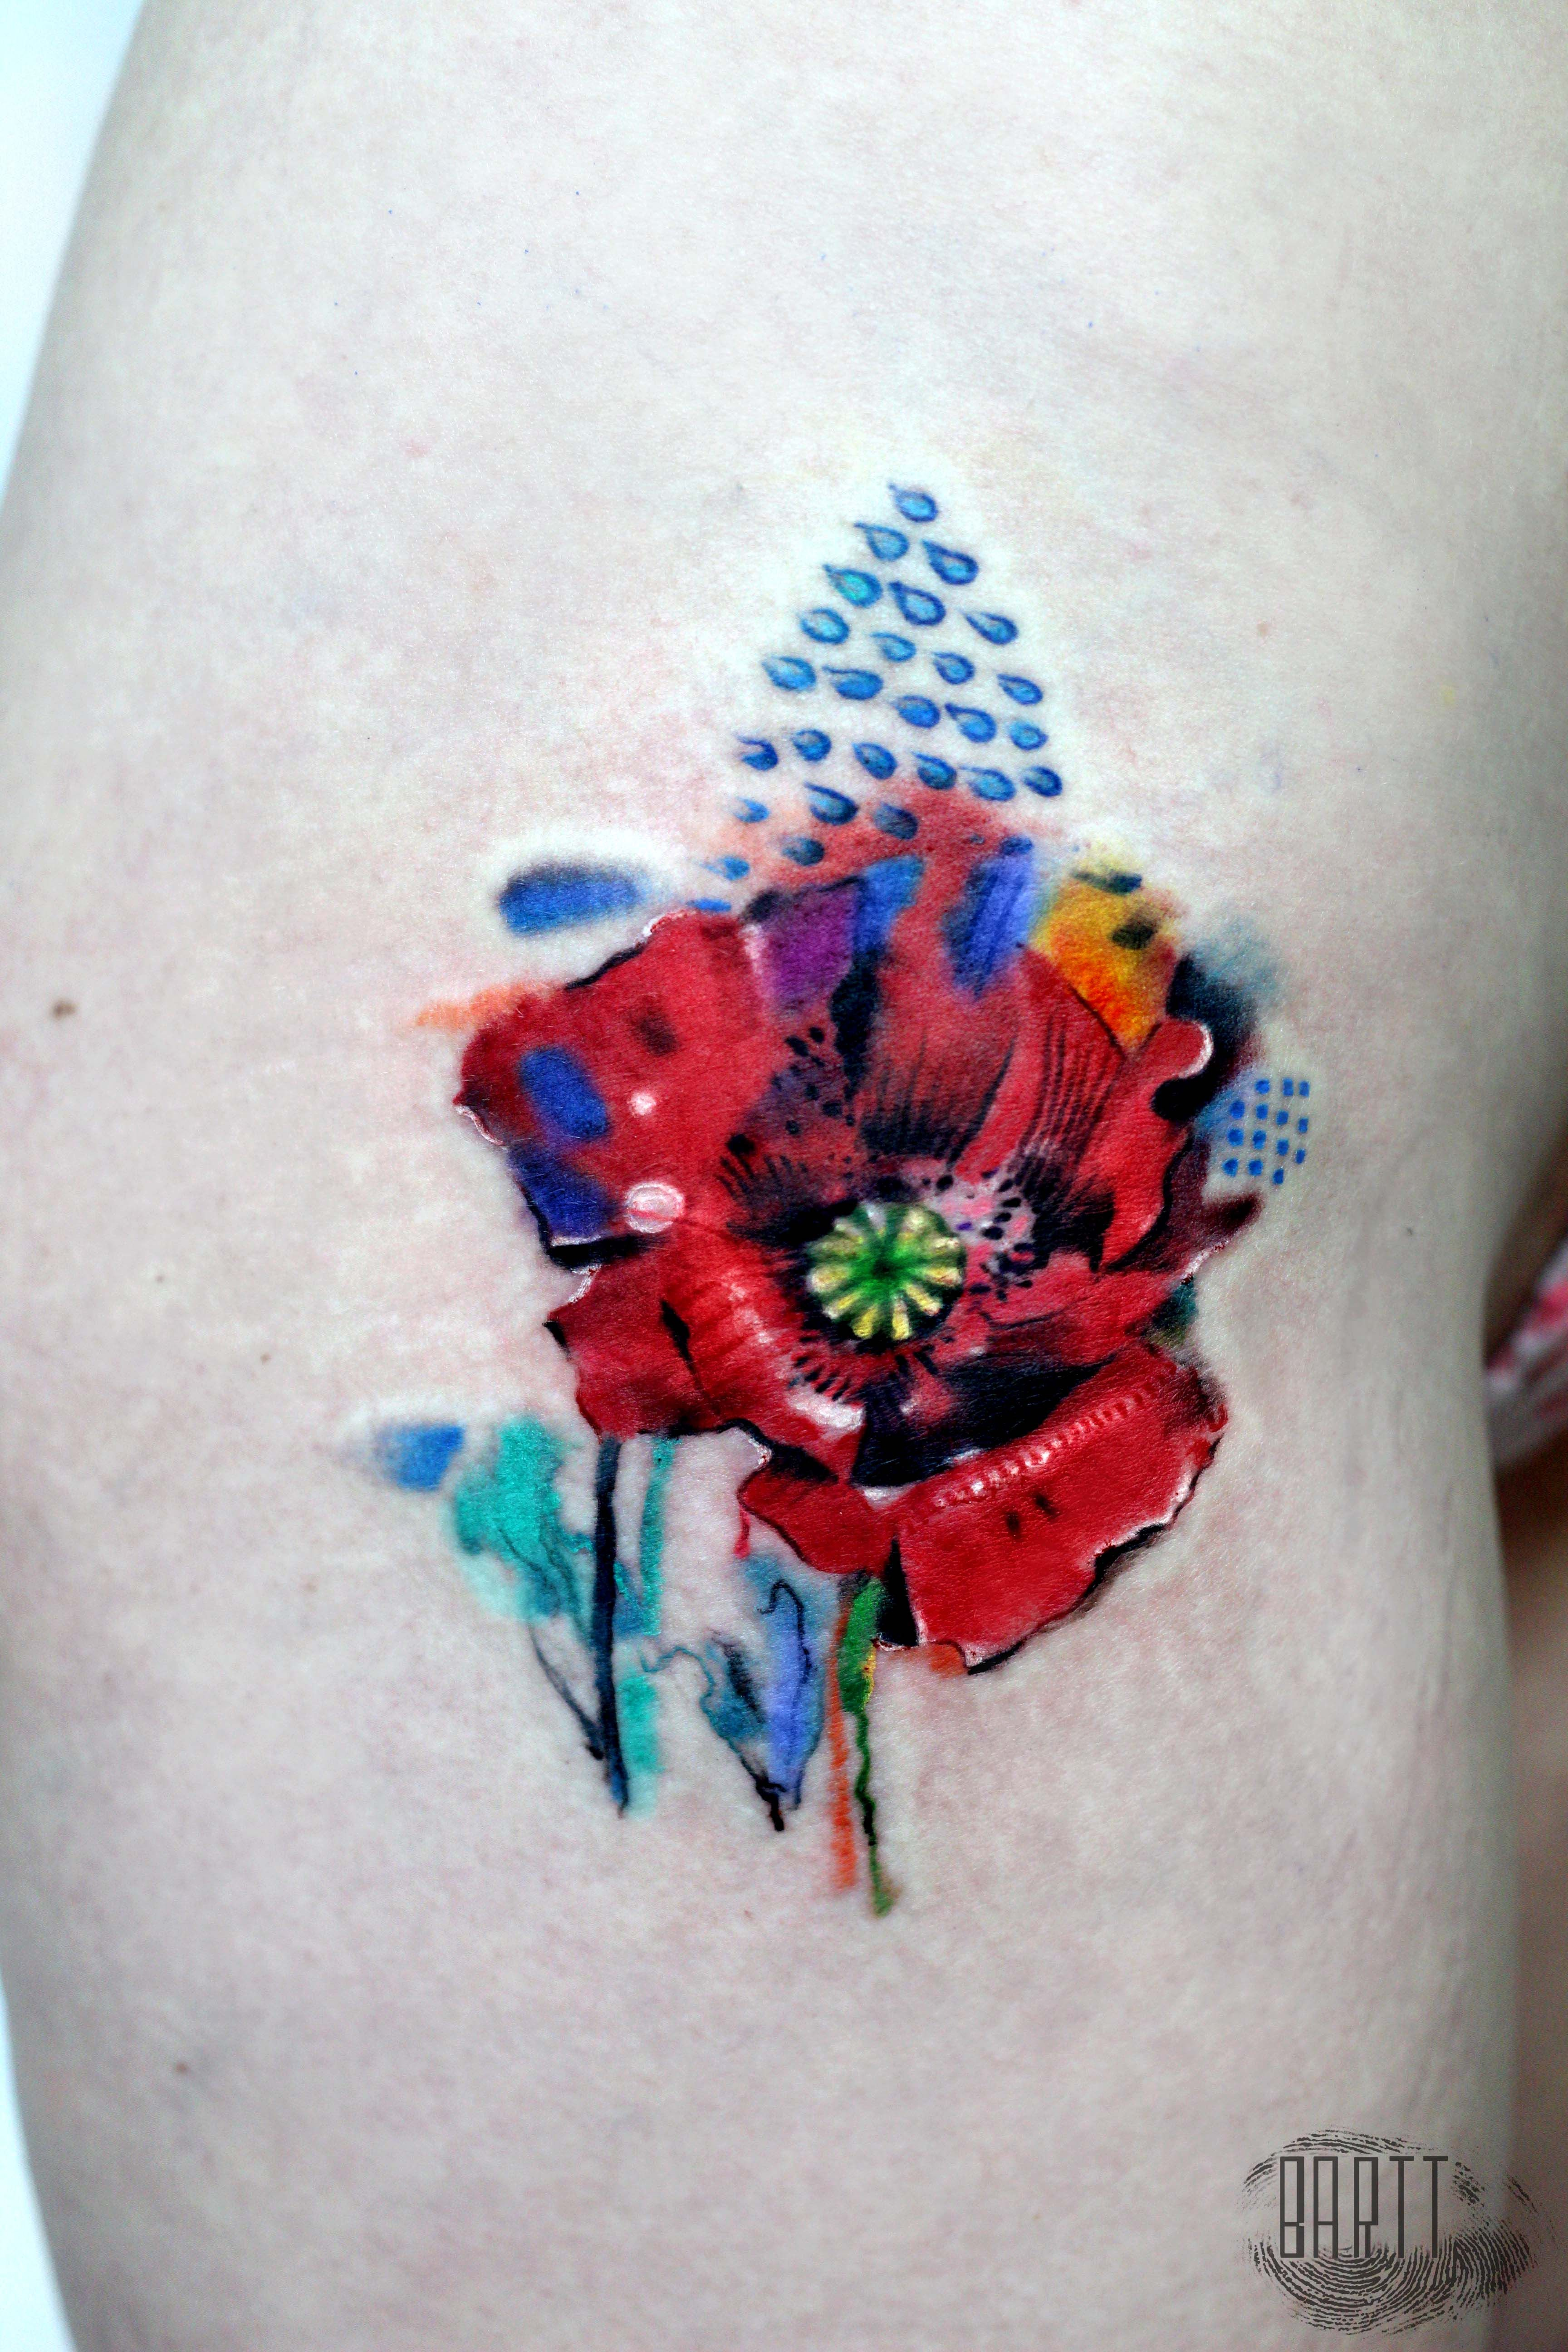 Pin by Carolin Thomson on tatoo | Pinterest | Tatoo and Tattoo